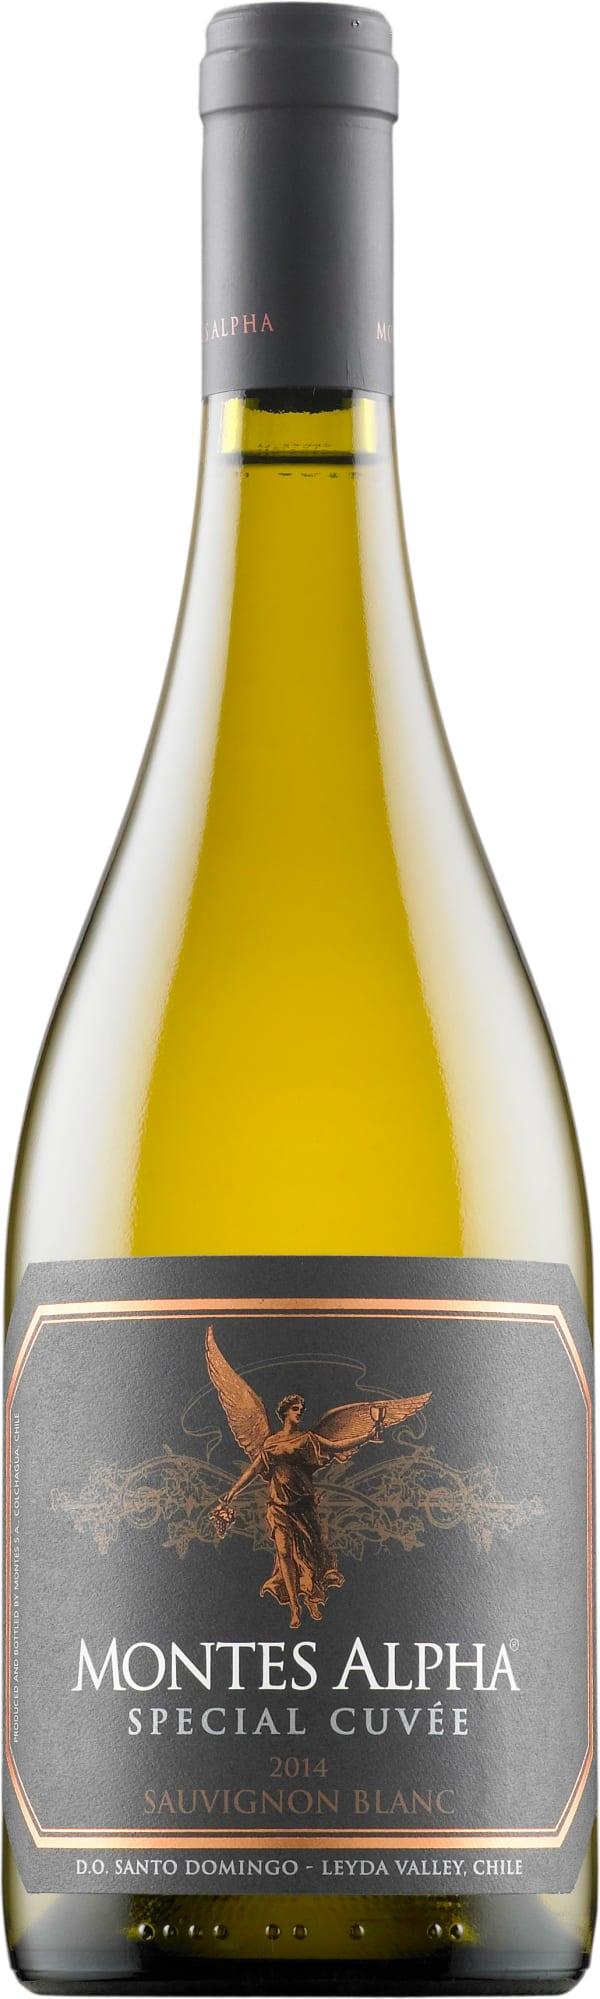 Montes Alpha Special Cuvée Sauvignon Blanc 2016